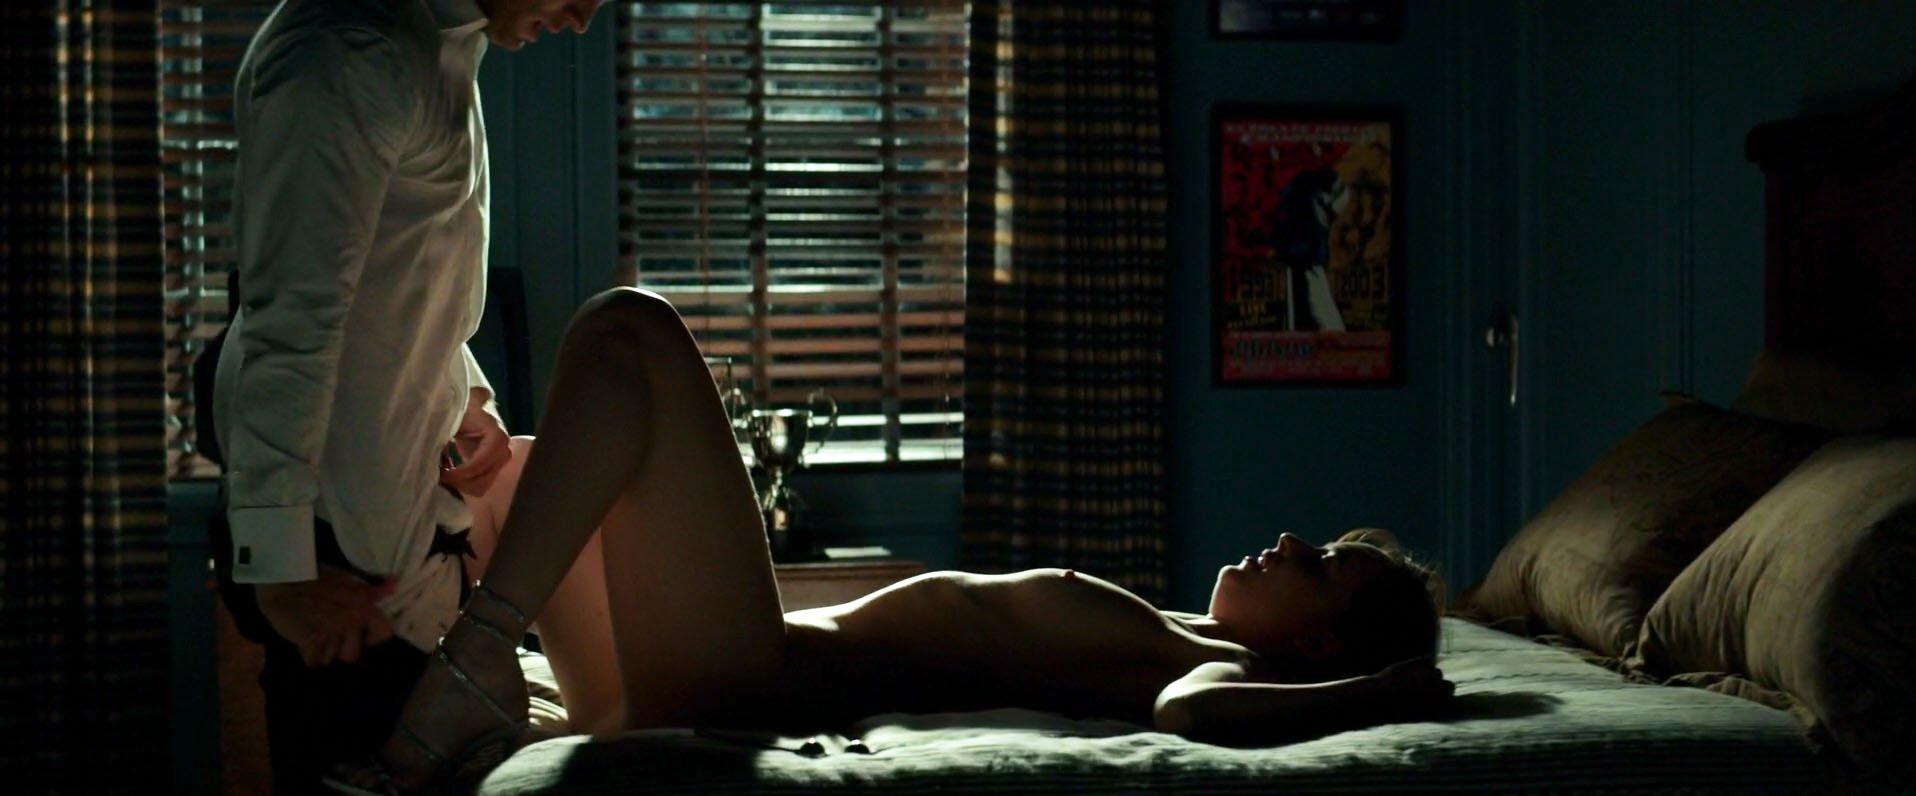 Dakota johnson nude 50 shades darker